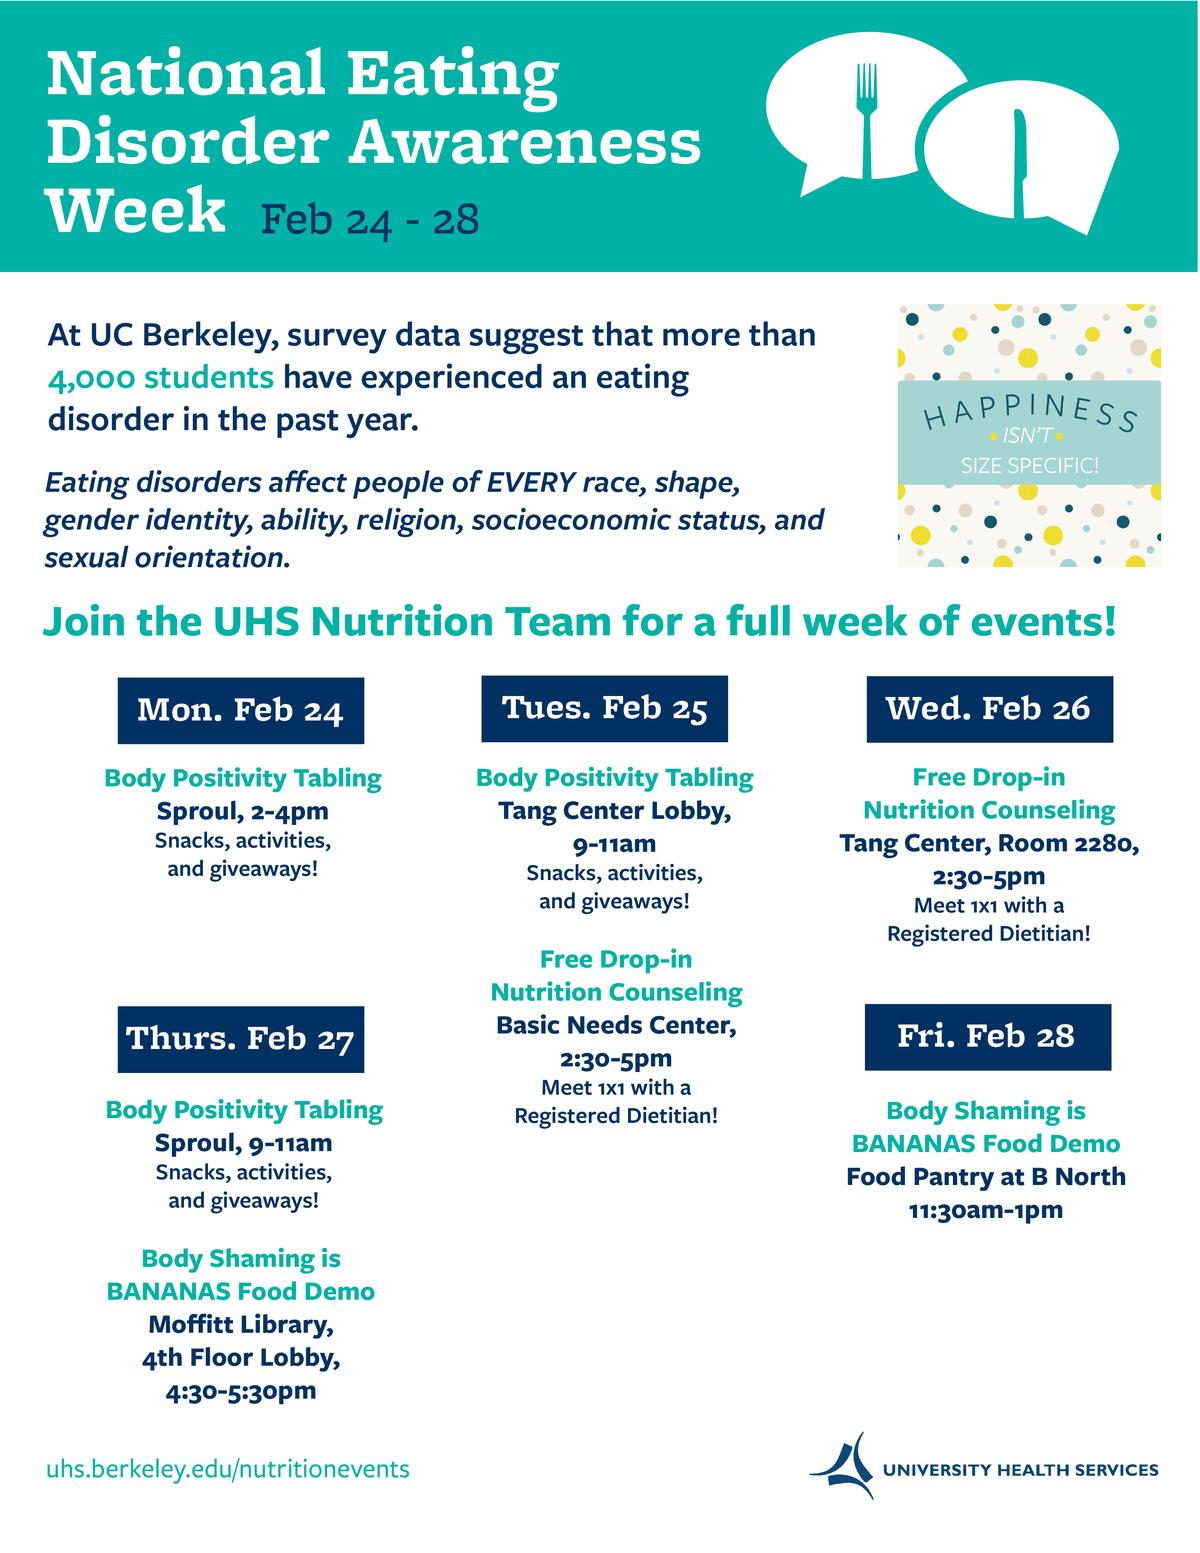 National Eating Disorder Awareness Week Flier